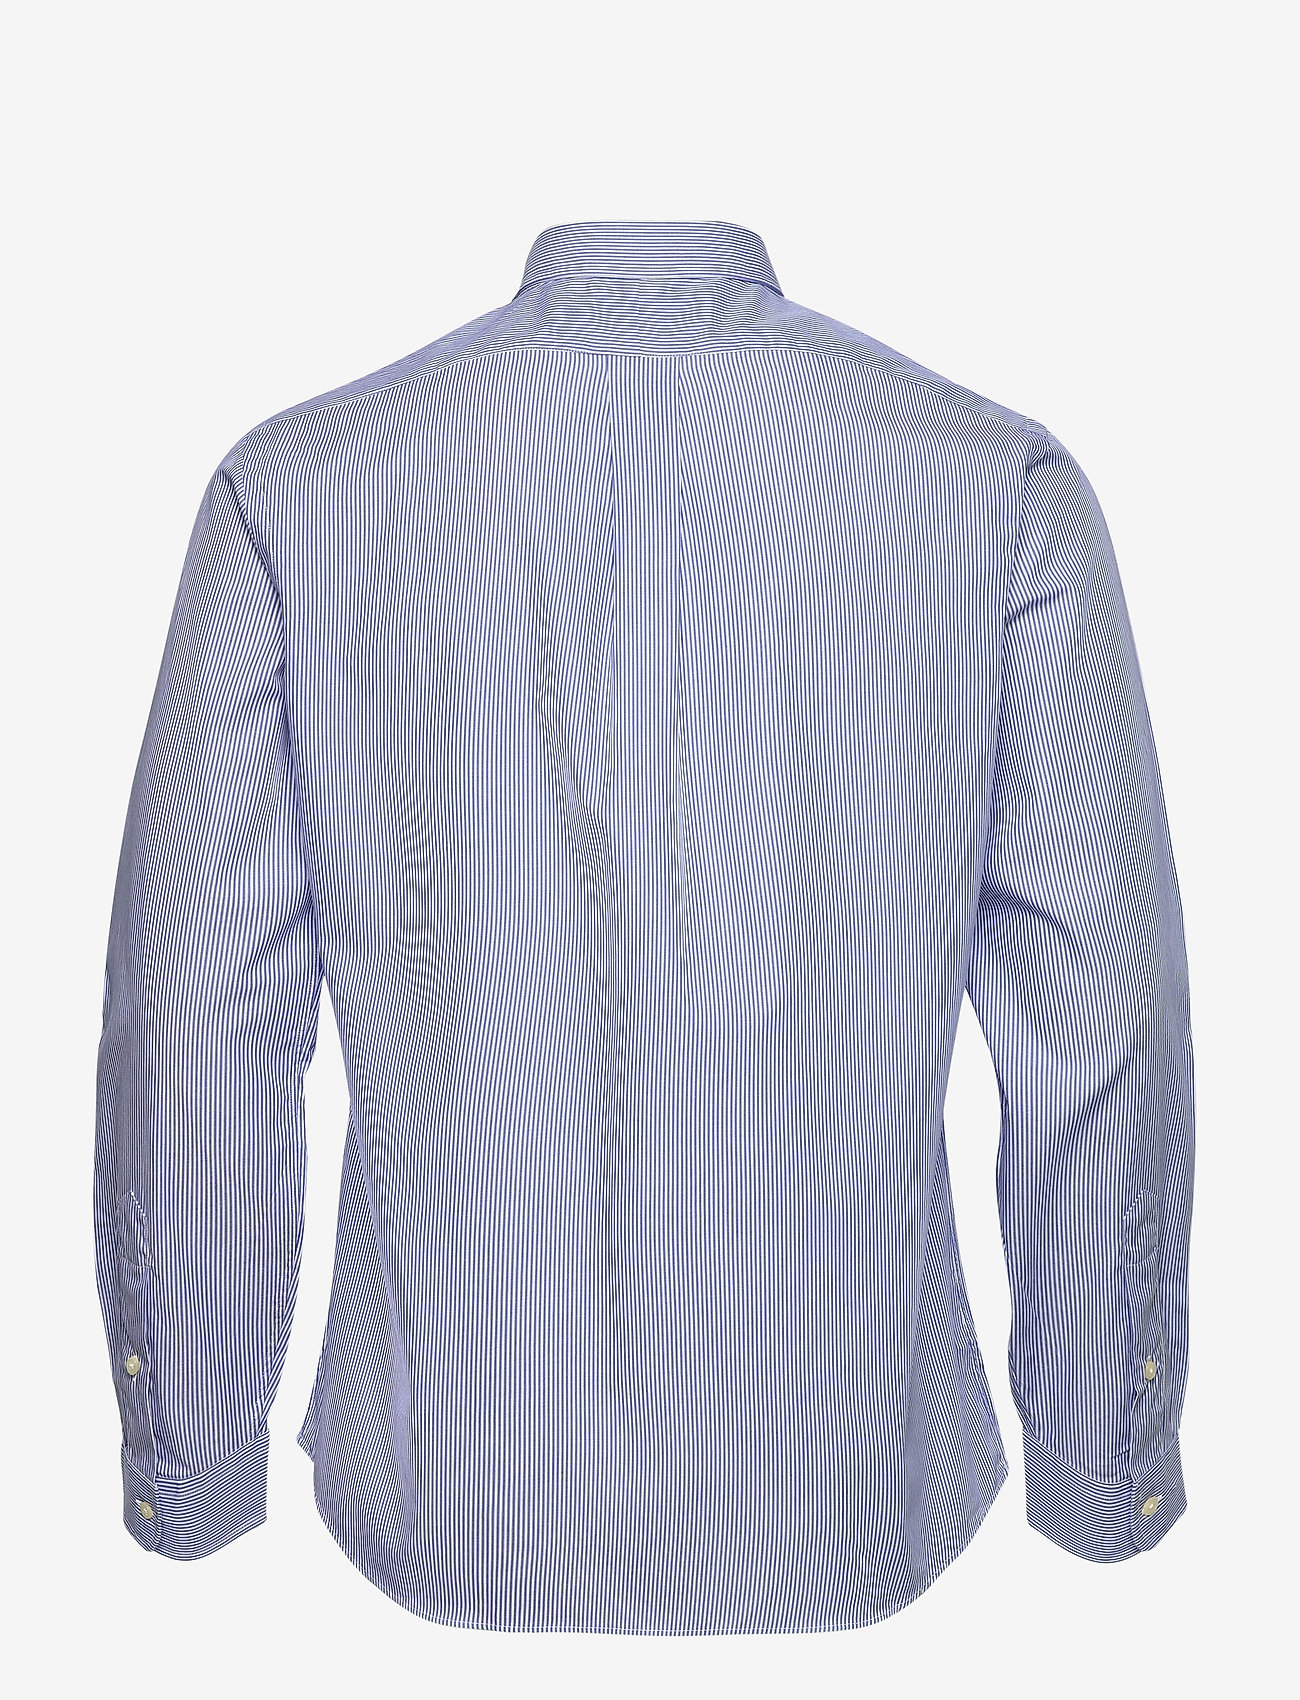 Polo Ralph Lauren - Custom Fit Poplin Shirt - podstawowe koszulki - 2866 blue/white h - 1